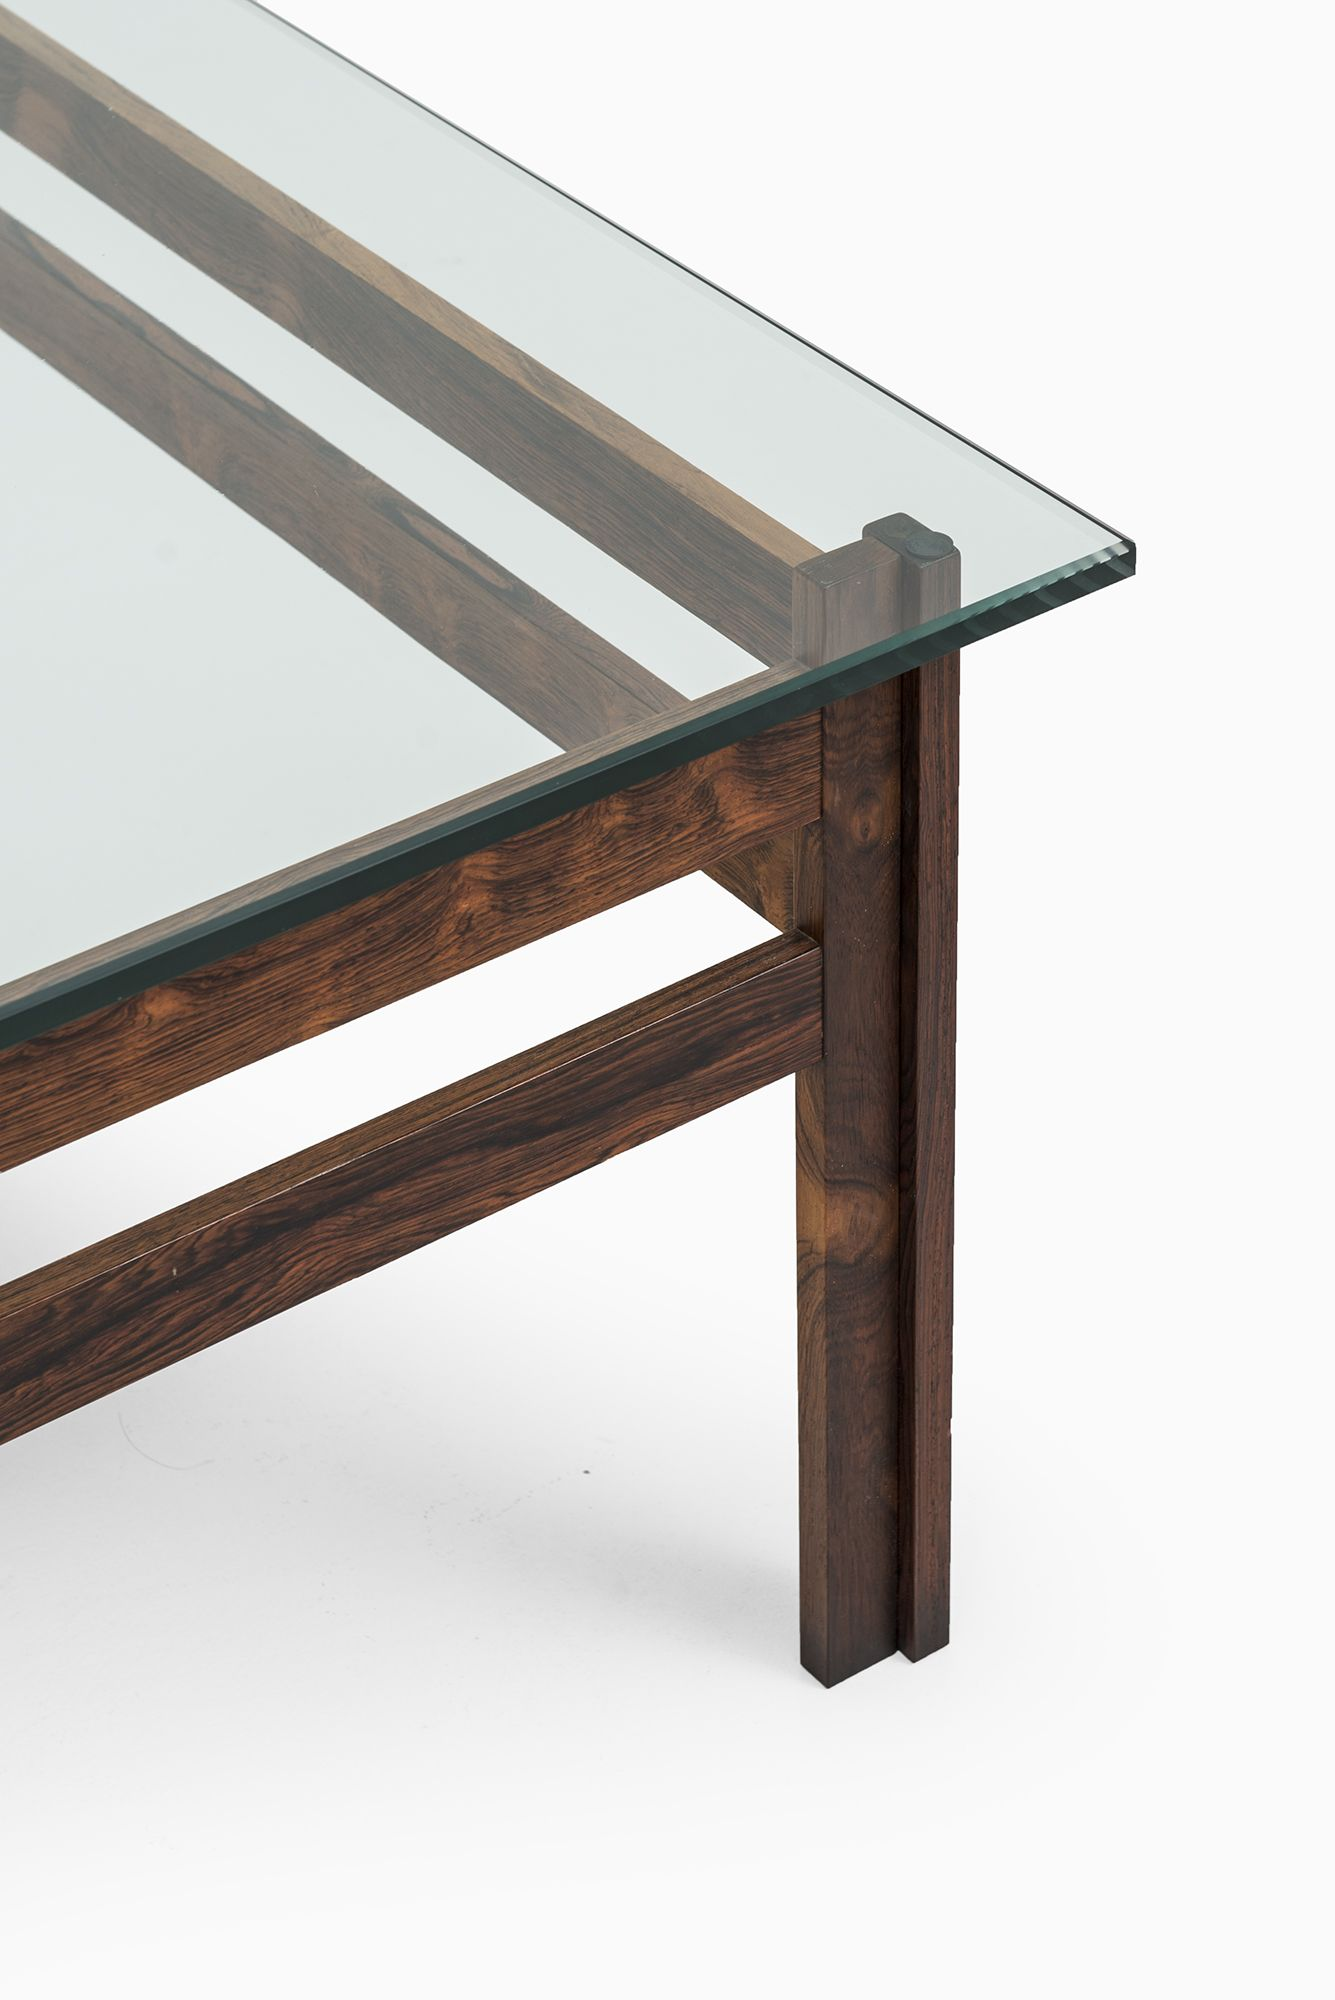 Mid Century Coffee Table Mid Century Coffee Table Coffee Table Mid Century [ 2000 x 1335 Pixel ]